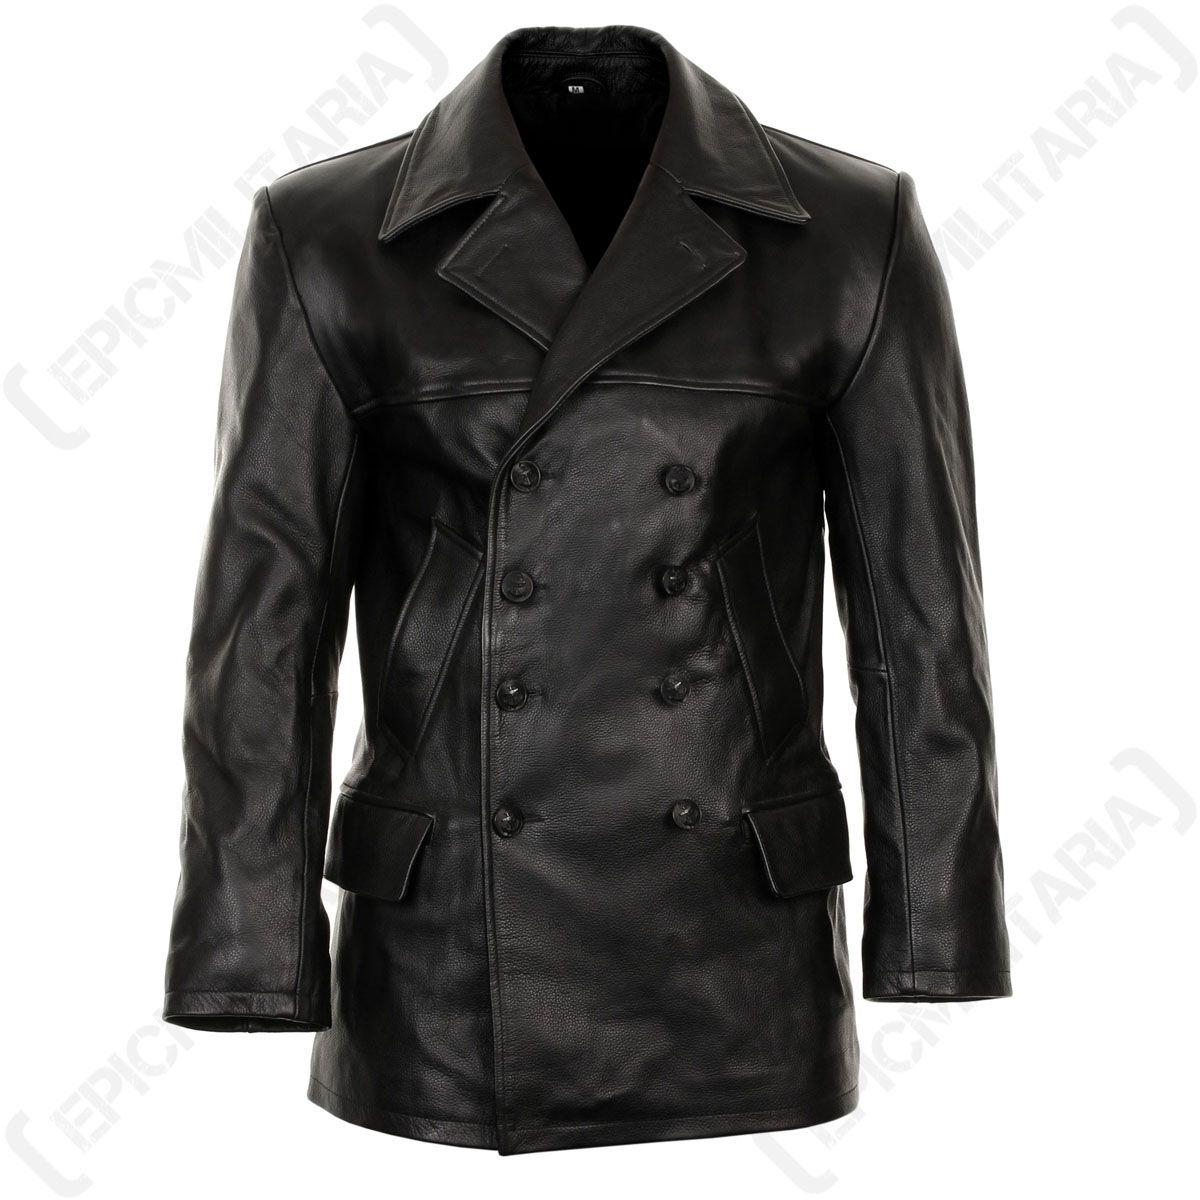 uboat_leather_jacket_sku2614u_2_wm.jpg